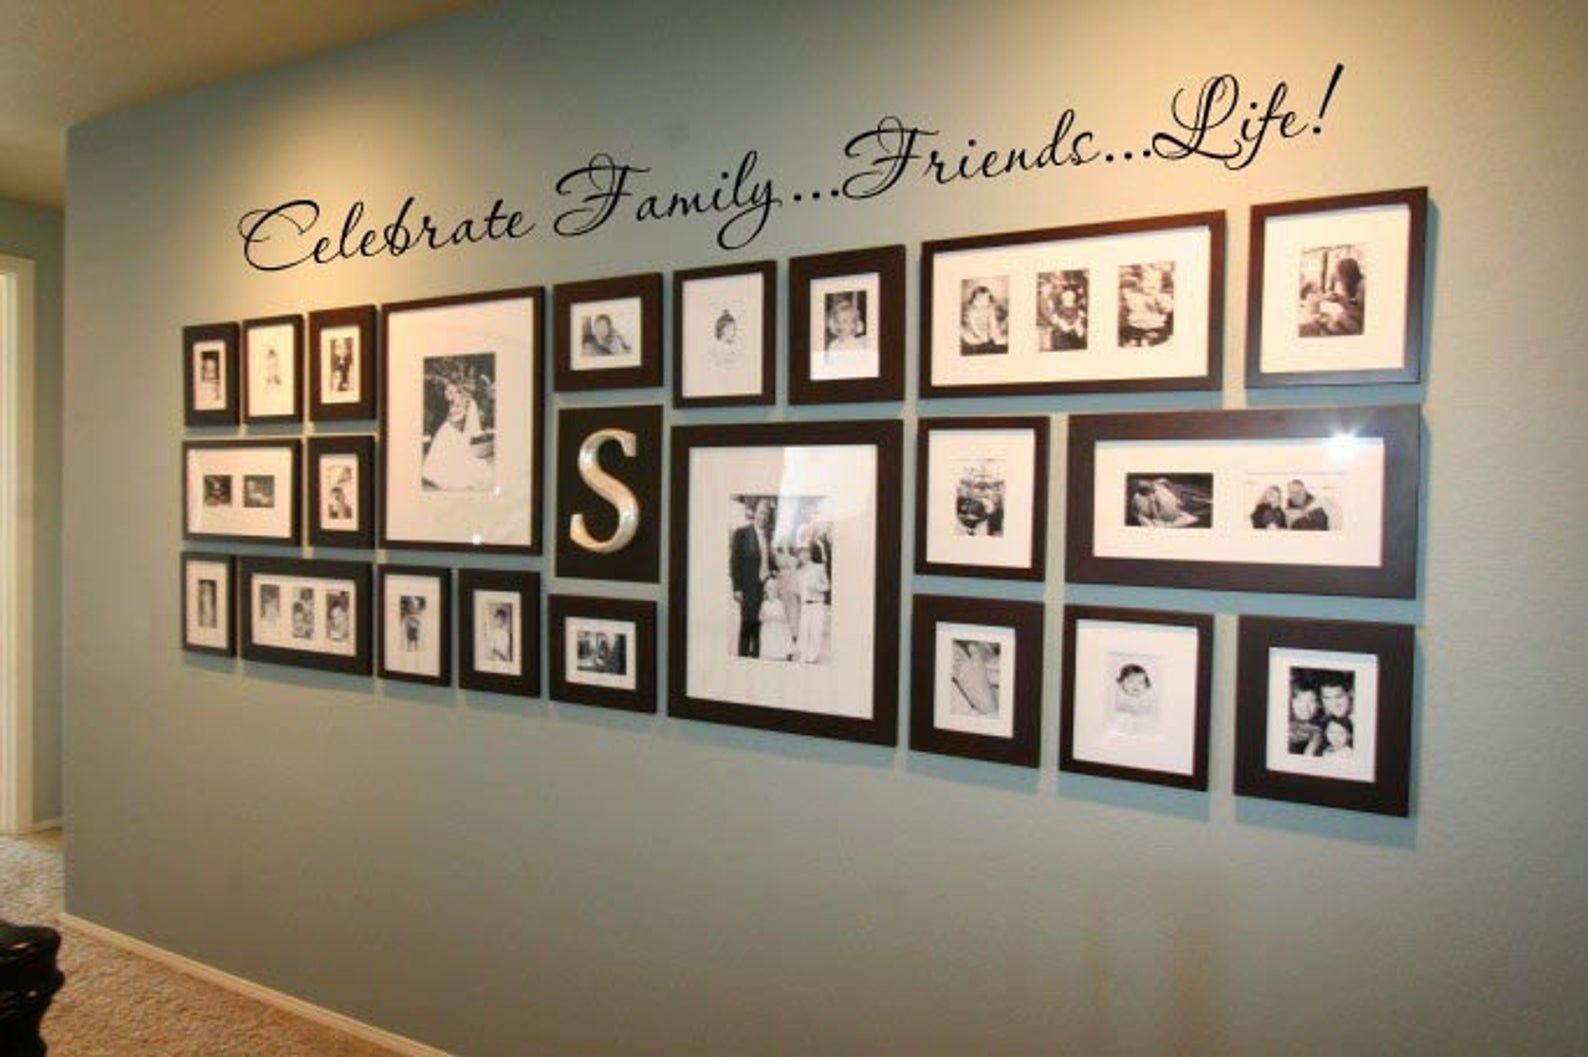 Celebrate Family...Friends...Life 52x5 Vinyl Decal